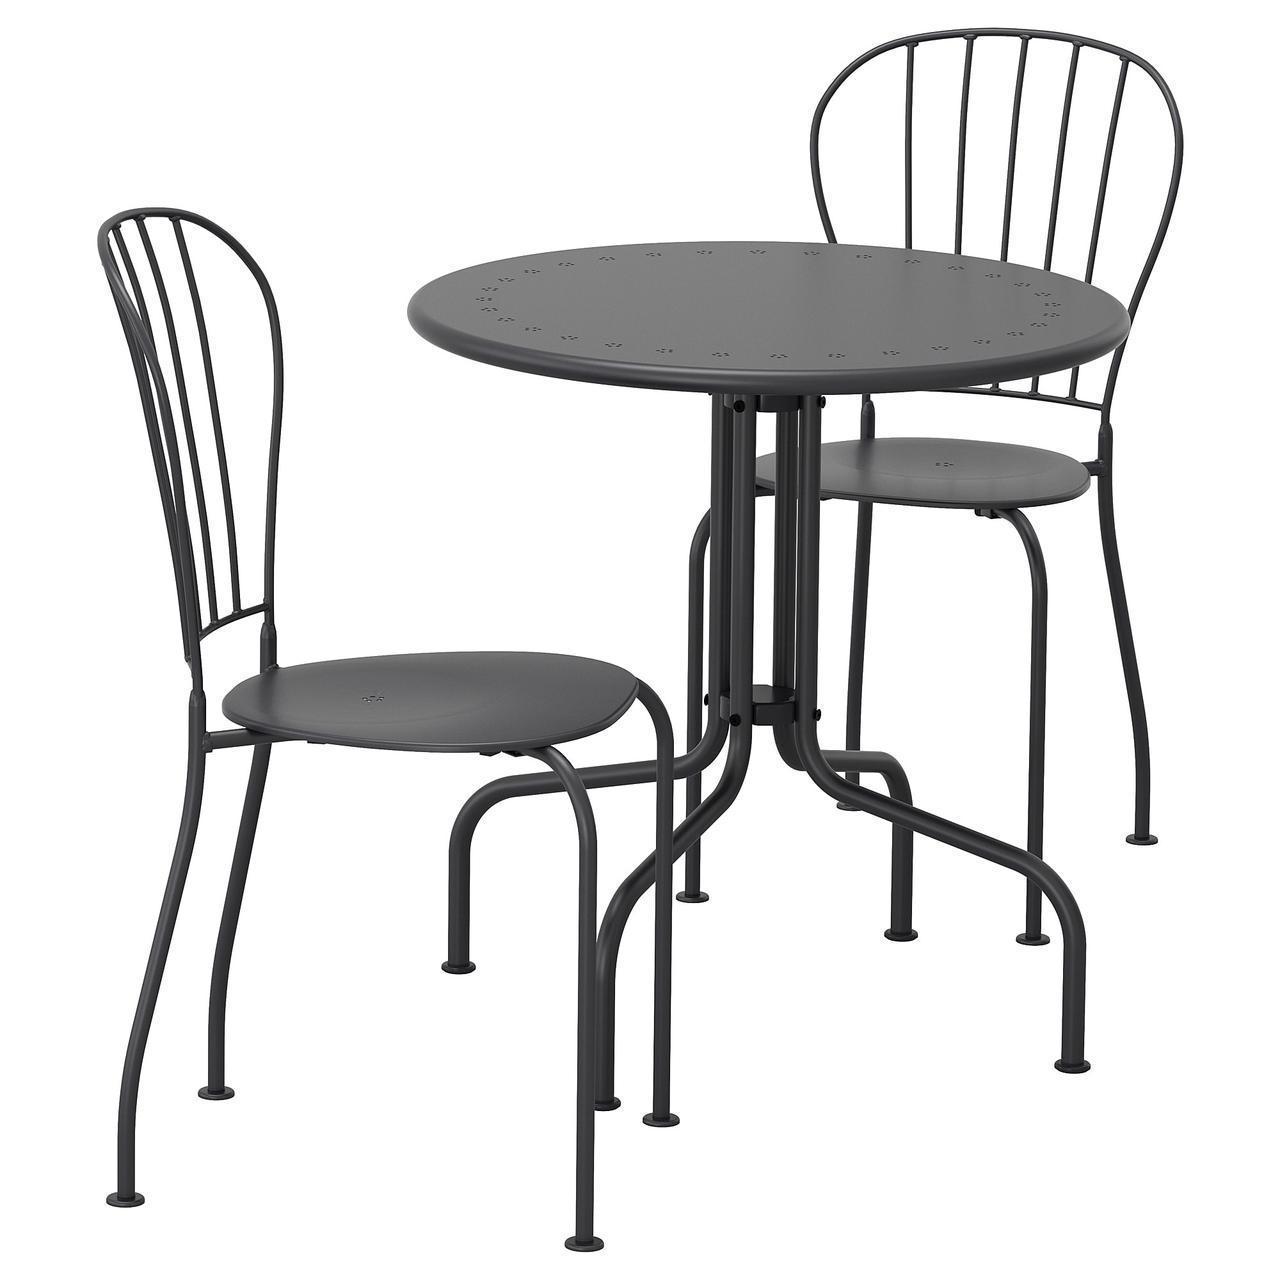 IKEA LACKO Садовый стол и 2 стула, серый  (498.984.35)